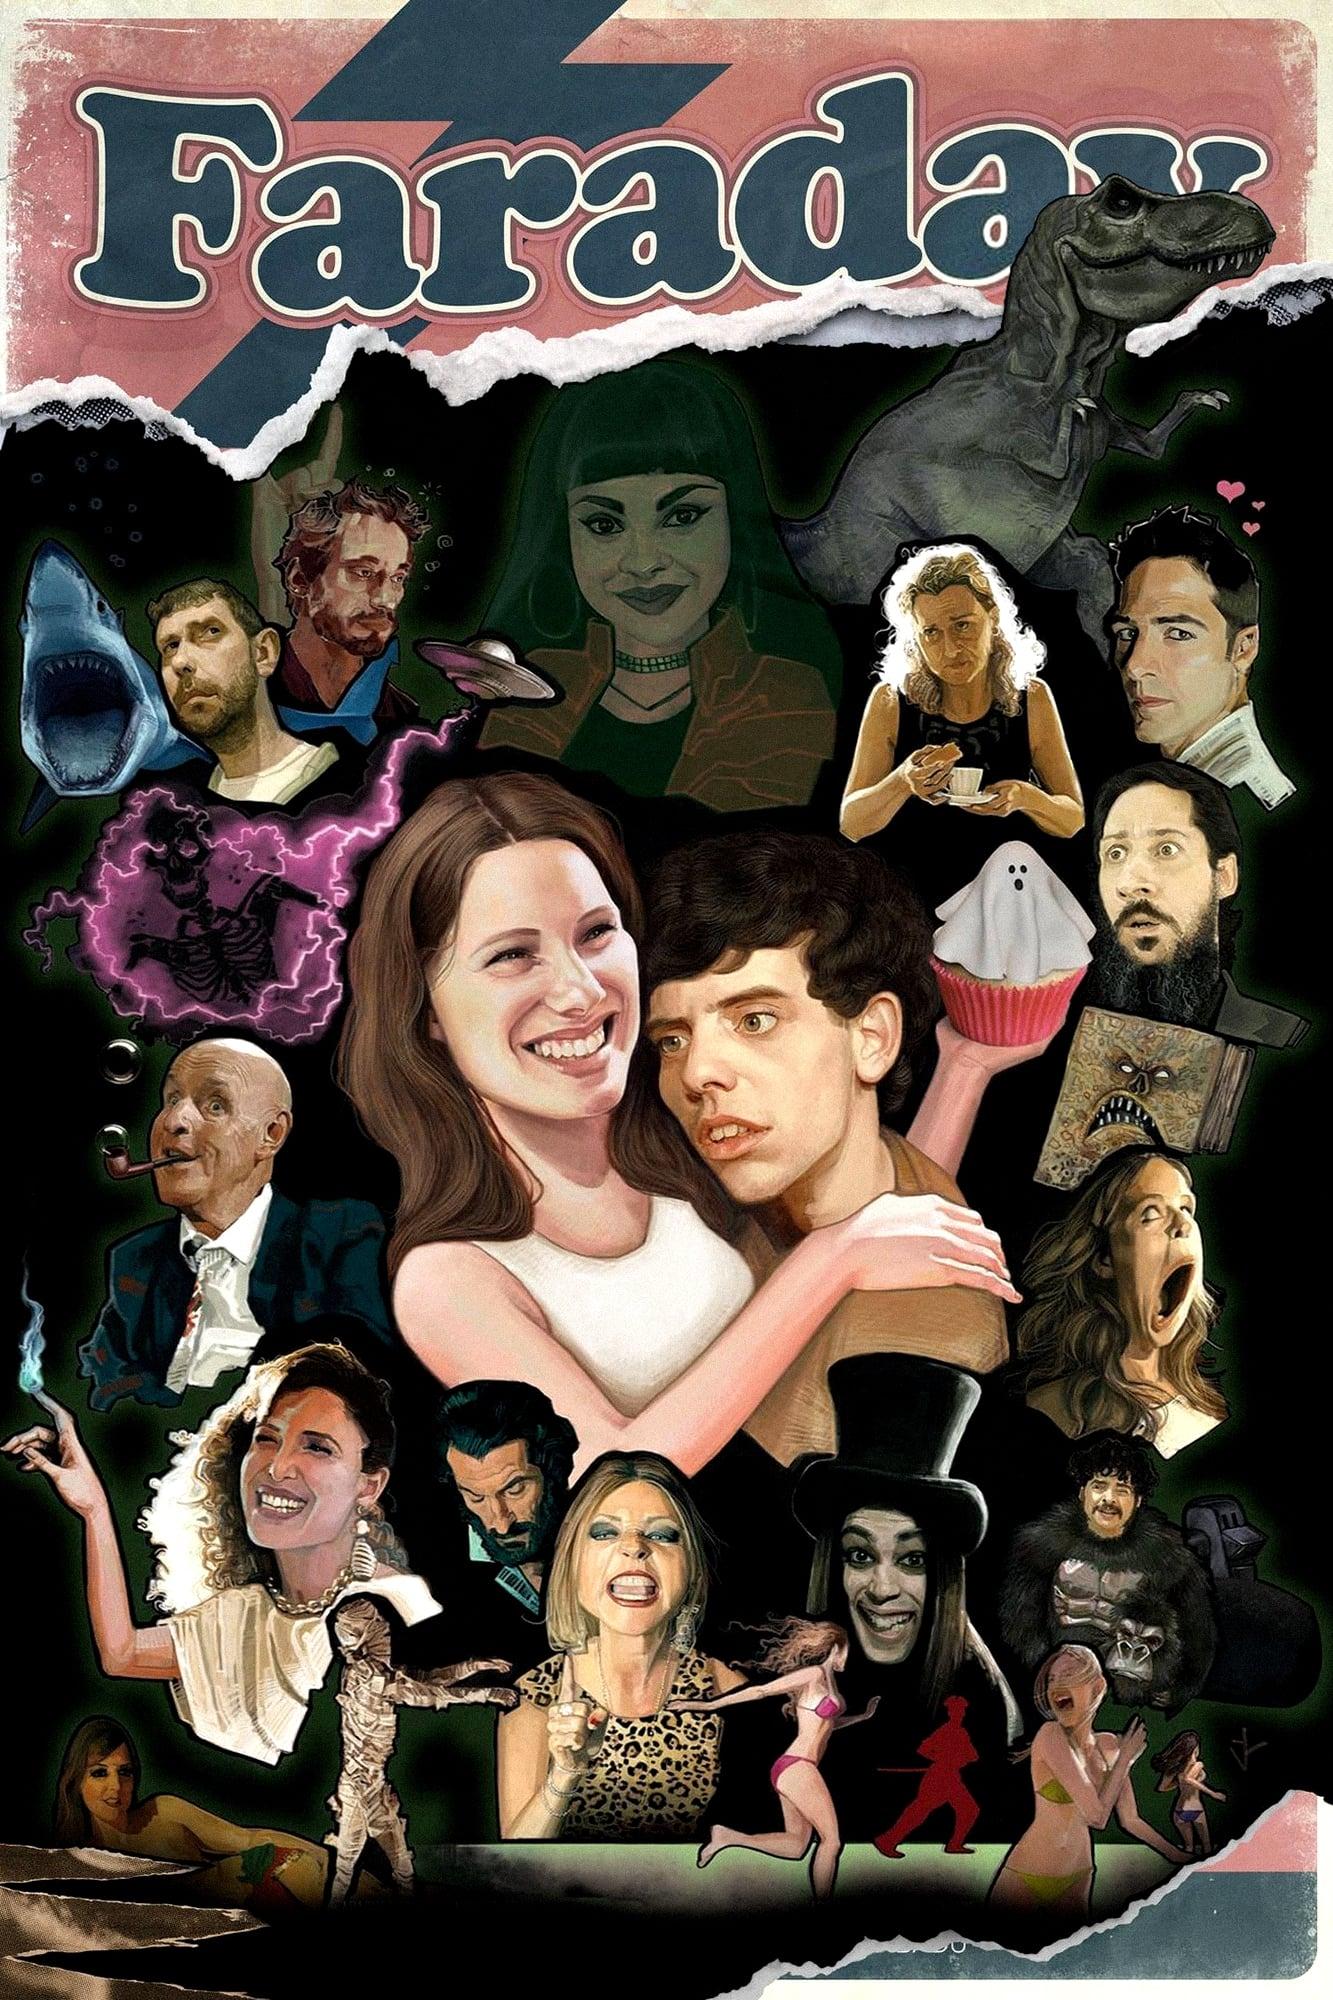 Hispania La Leyenda Full Movie ana de armas • all movies & filmography • moviefit